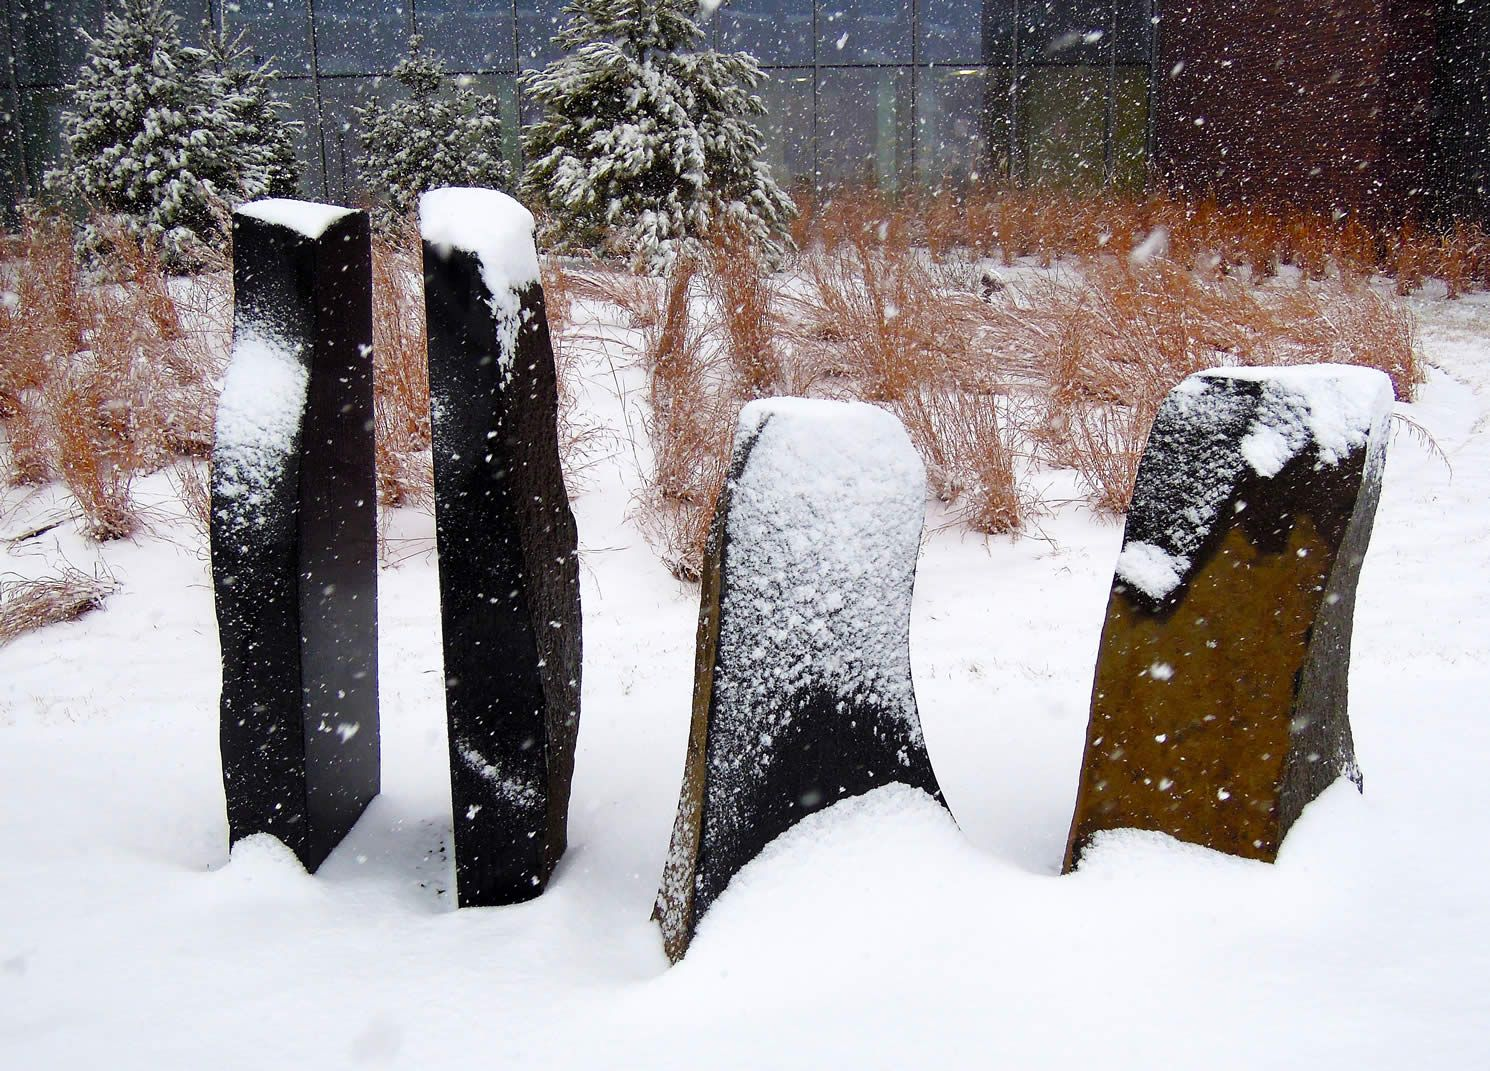 Philip Rickey's public art installation at University of Minnesota